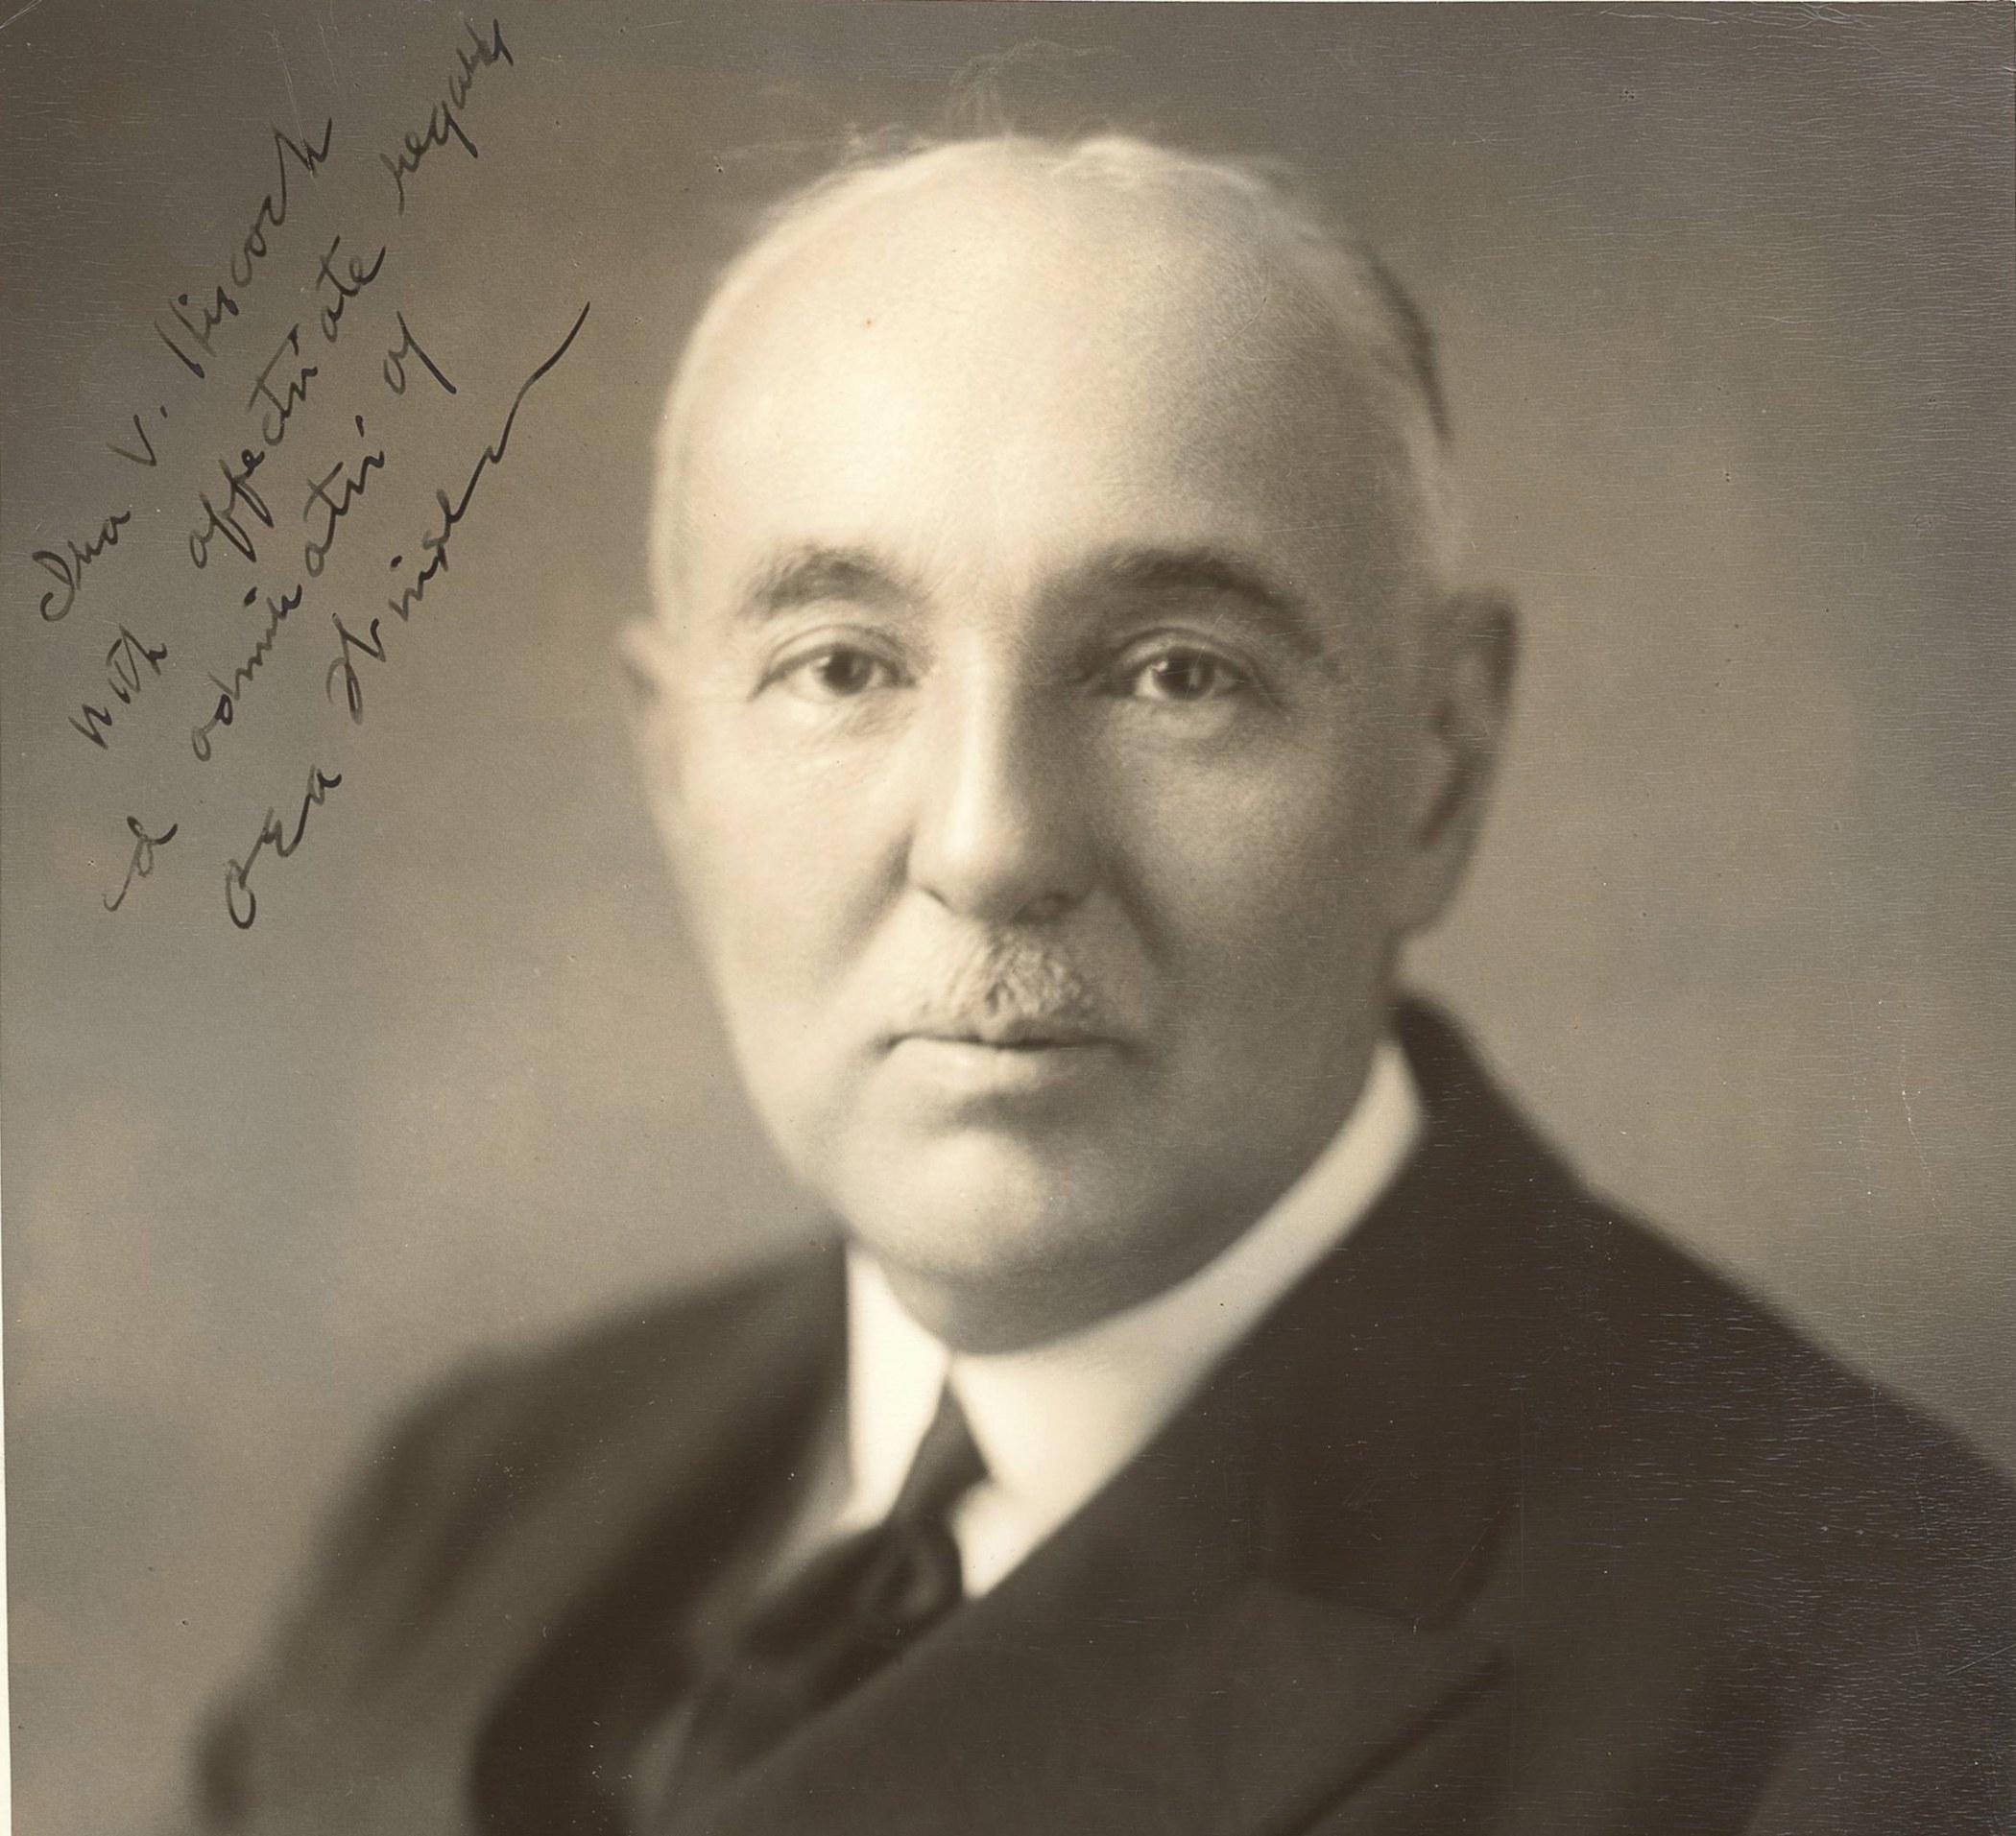 C.-E.A. Winslow